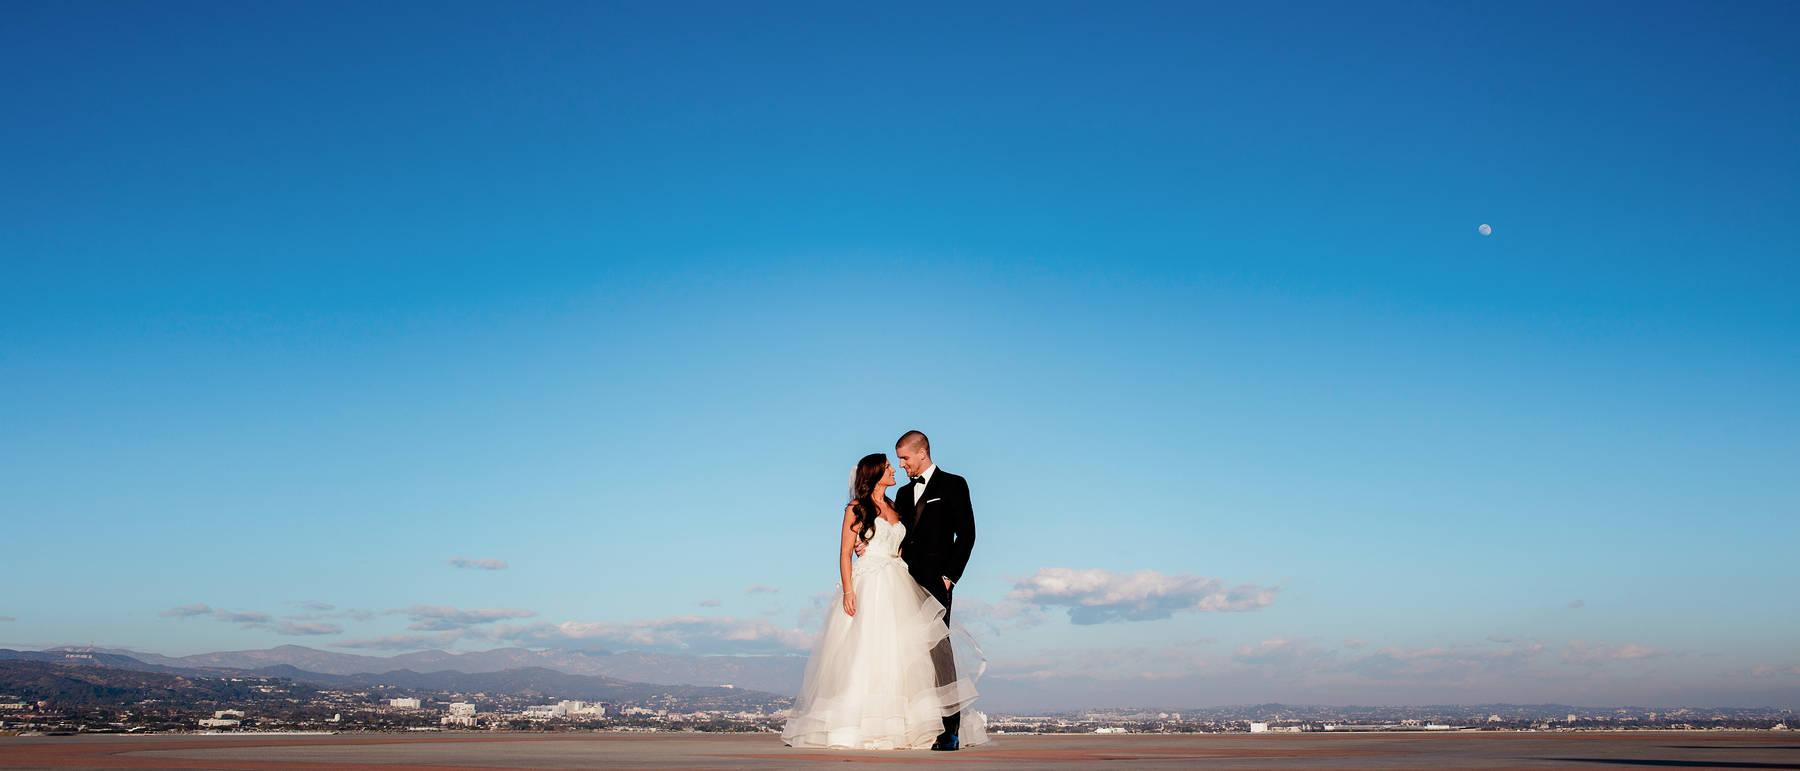 johnandjoseph-wedding-photographer-hz-slider-104